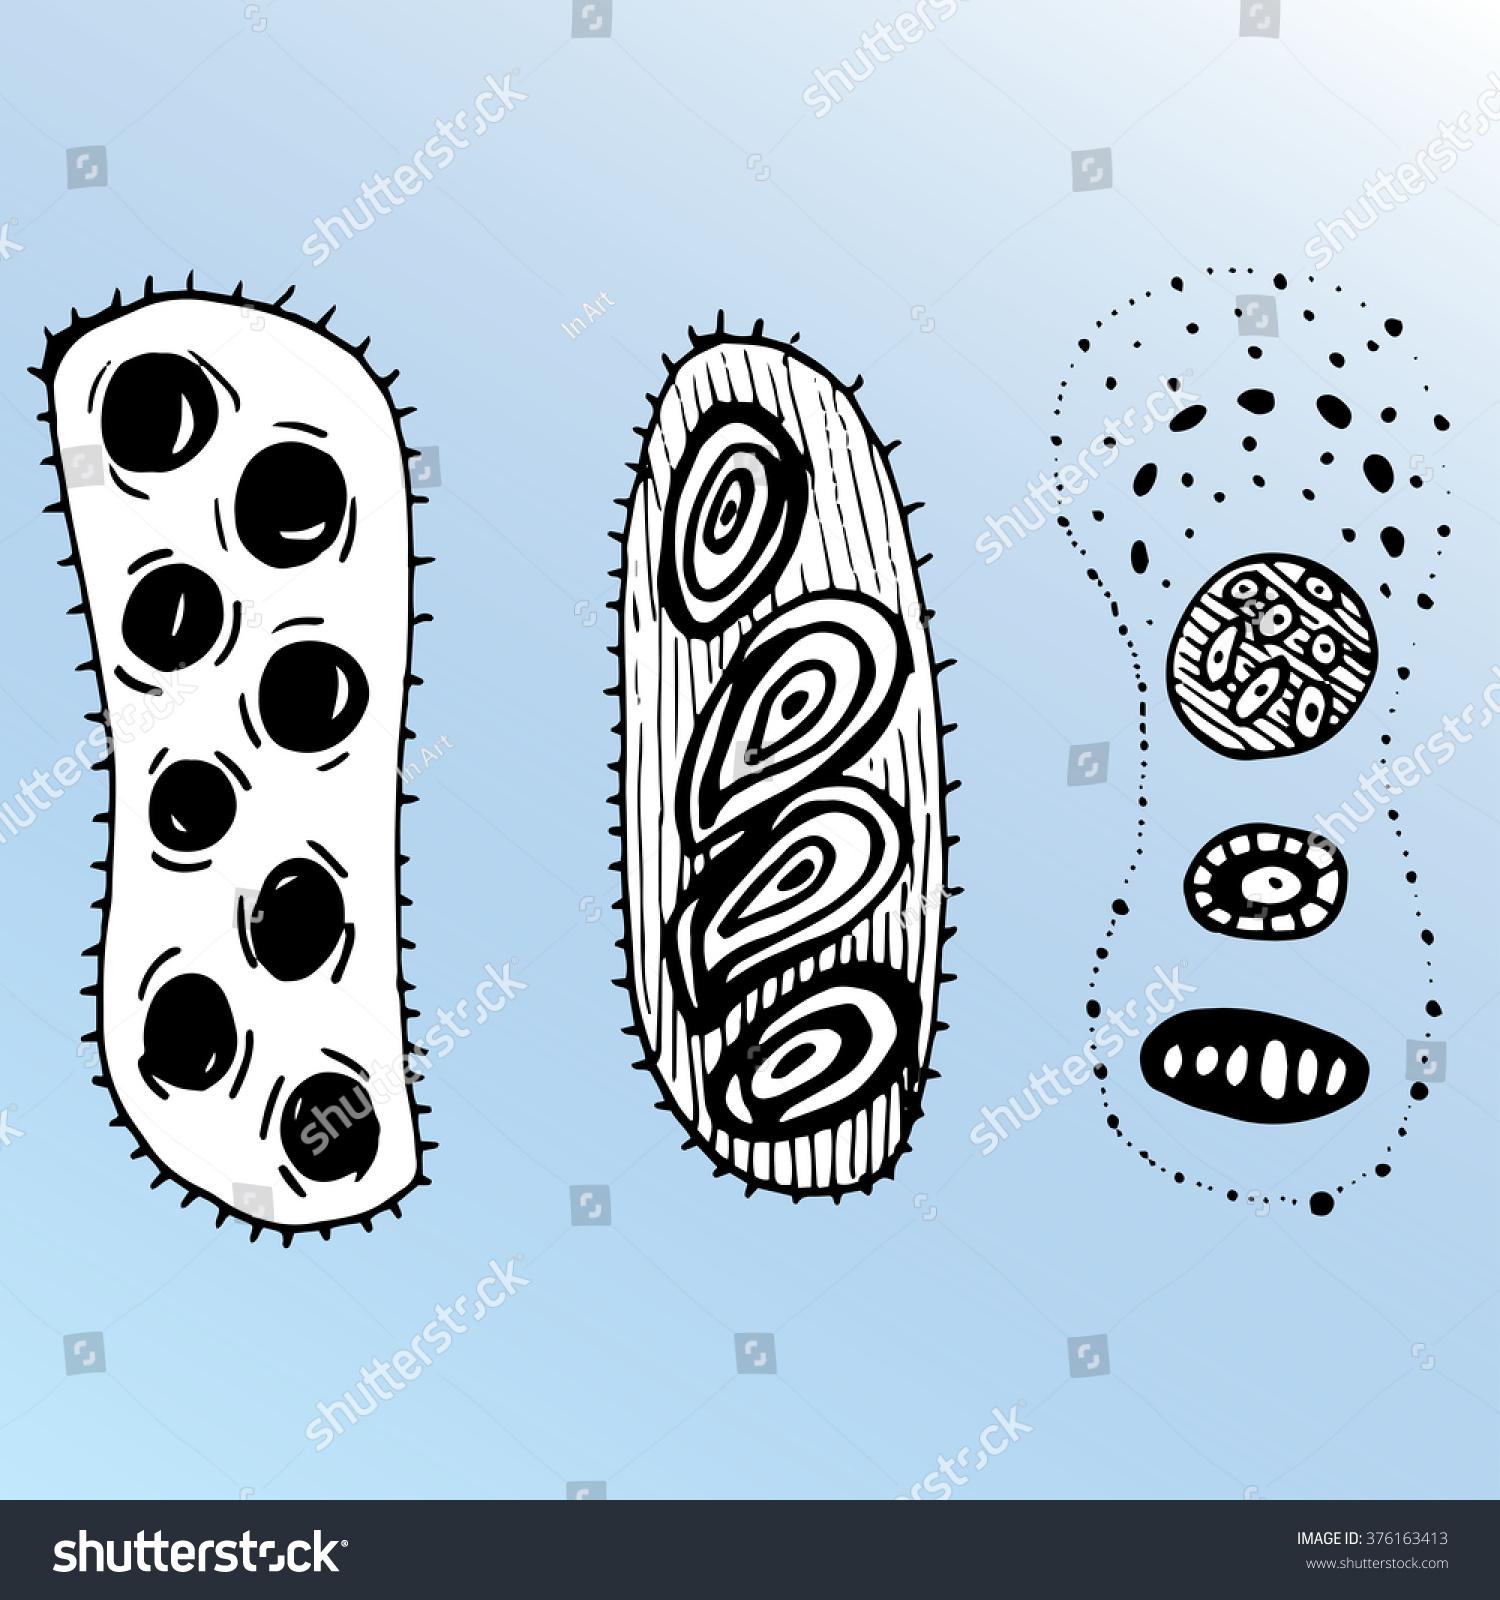 bacteria cells line art virus cartoon stock vector royalty free 376163413 https www shutterstock com image vector bacteria cells line art virus cartoon 376163413